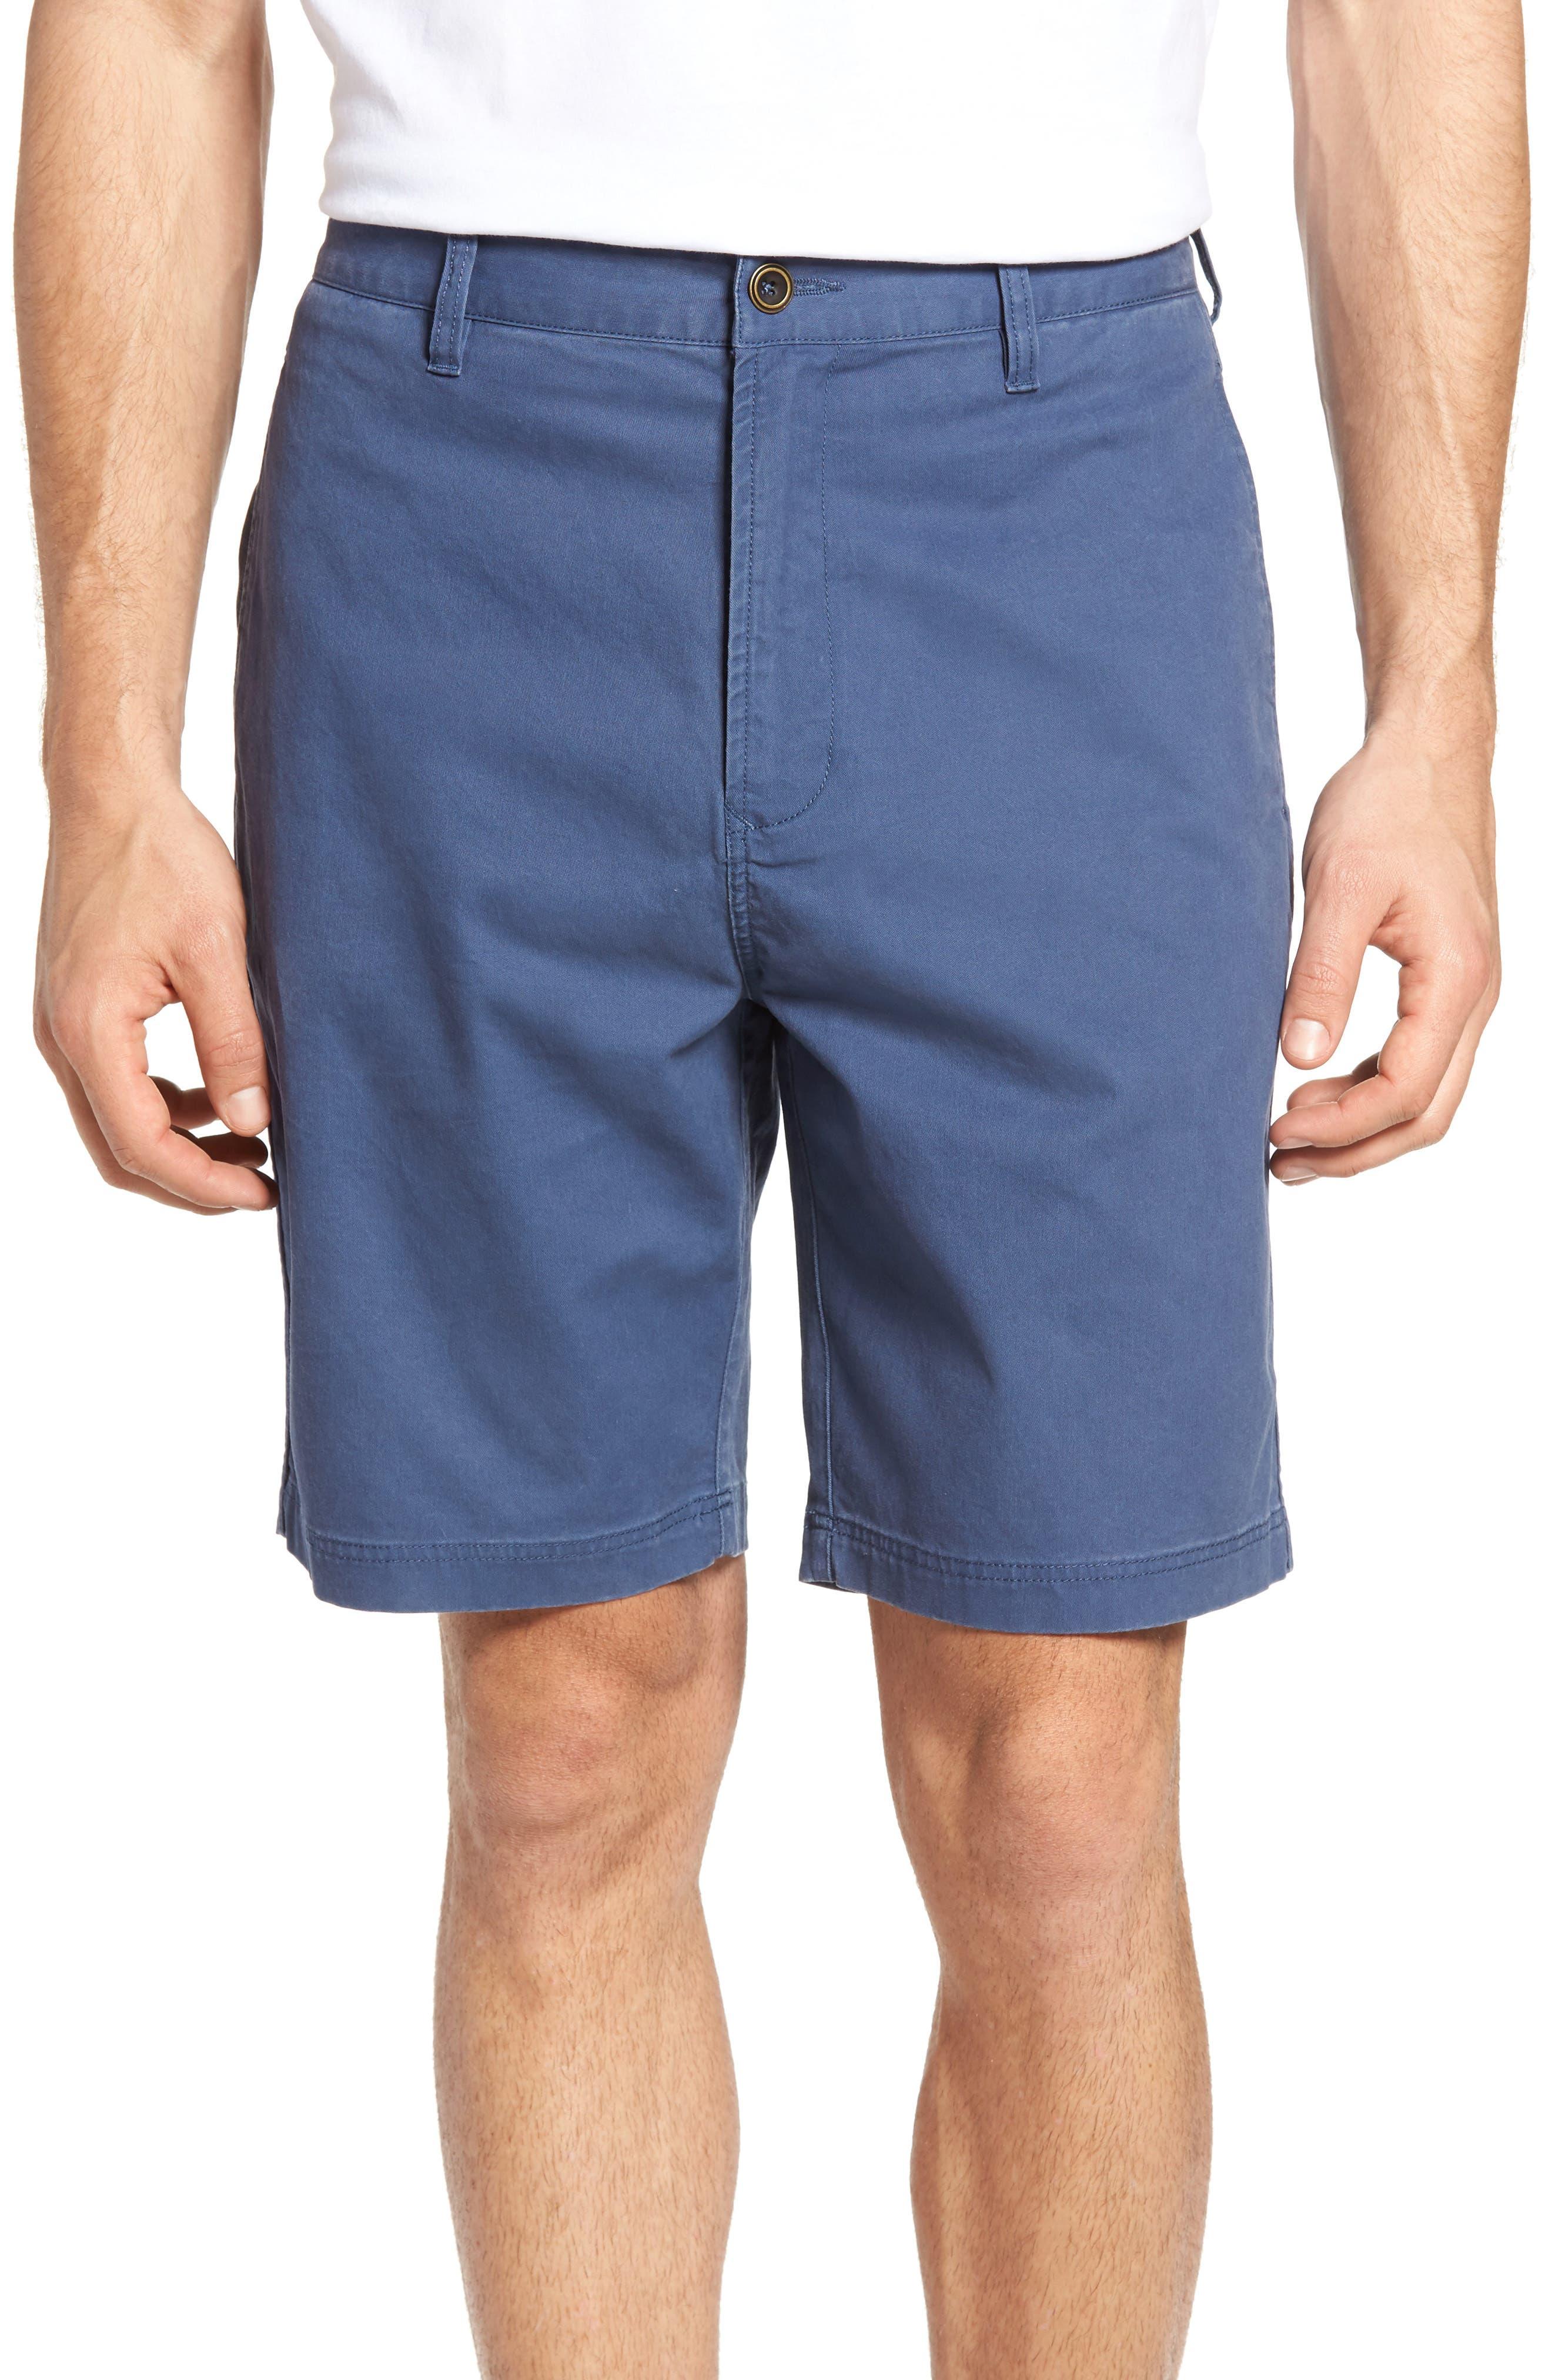 Glenburn Shorts,                         Main,                         color, Indigo